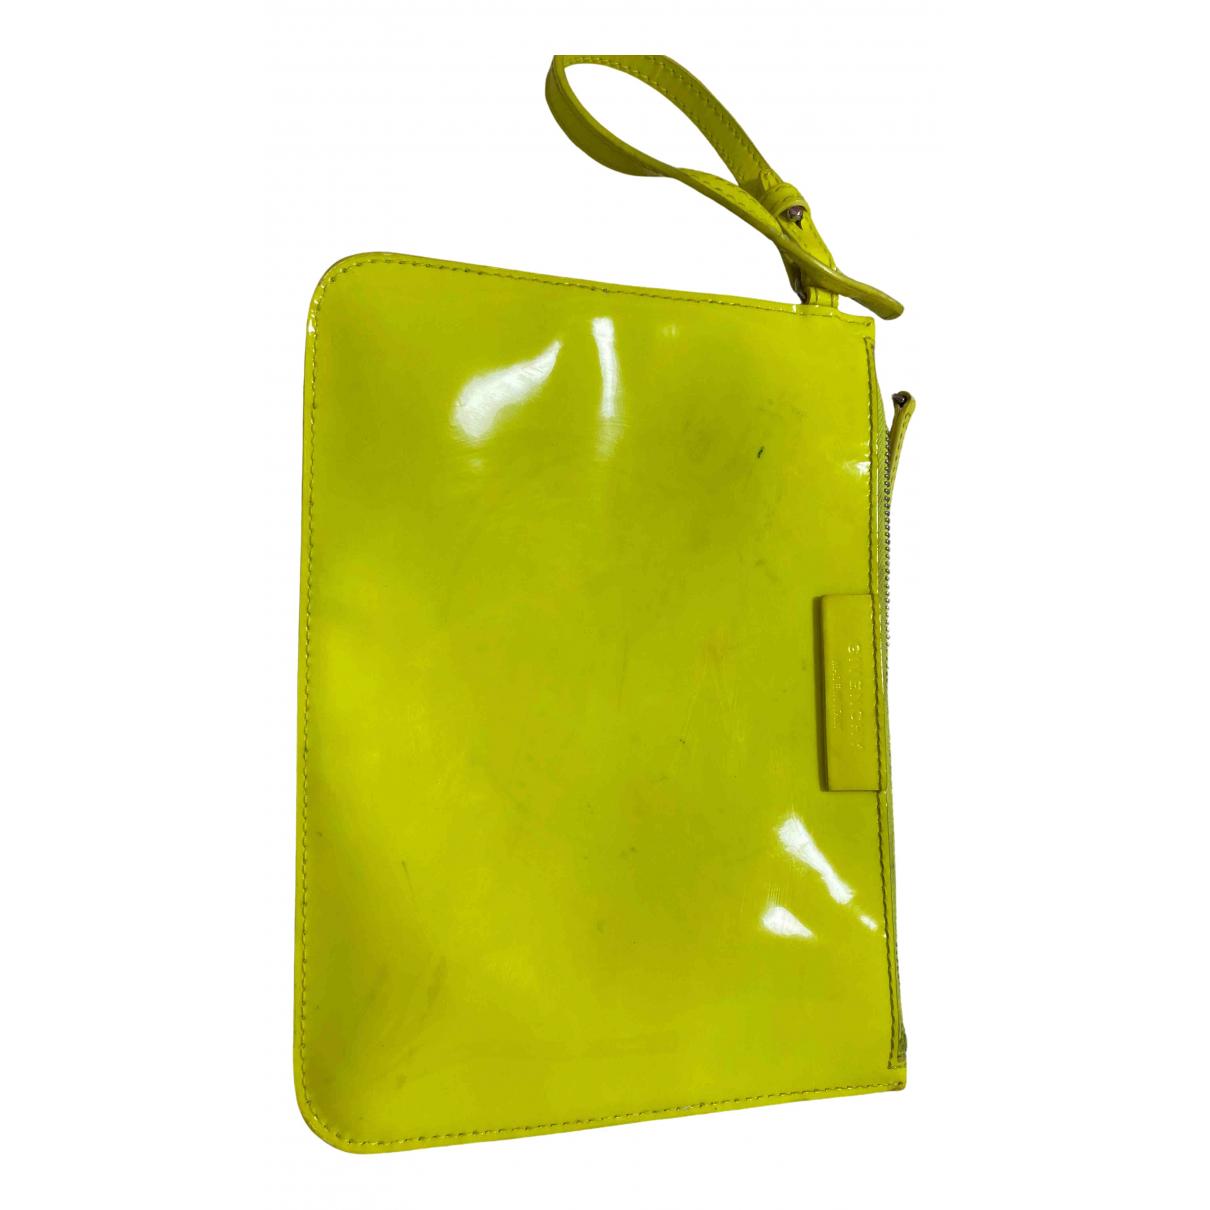 Givenchy \N Clutch in  Gelb Lackleder